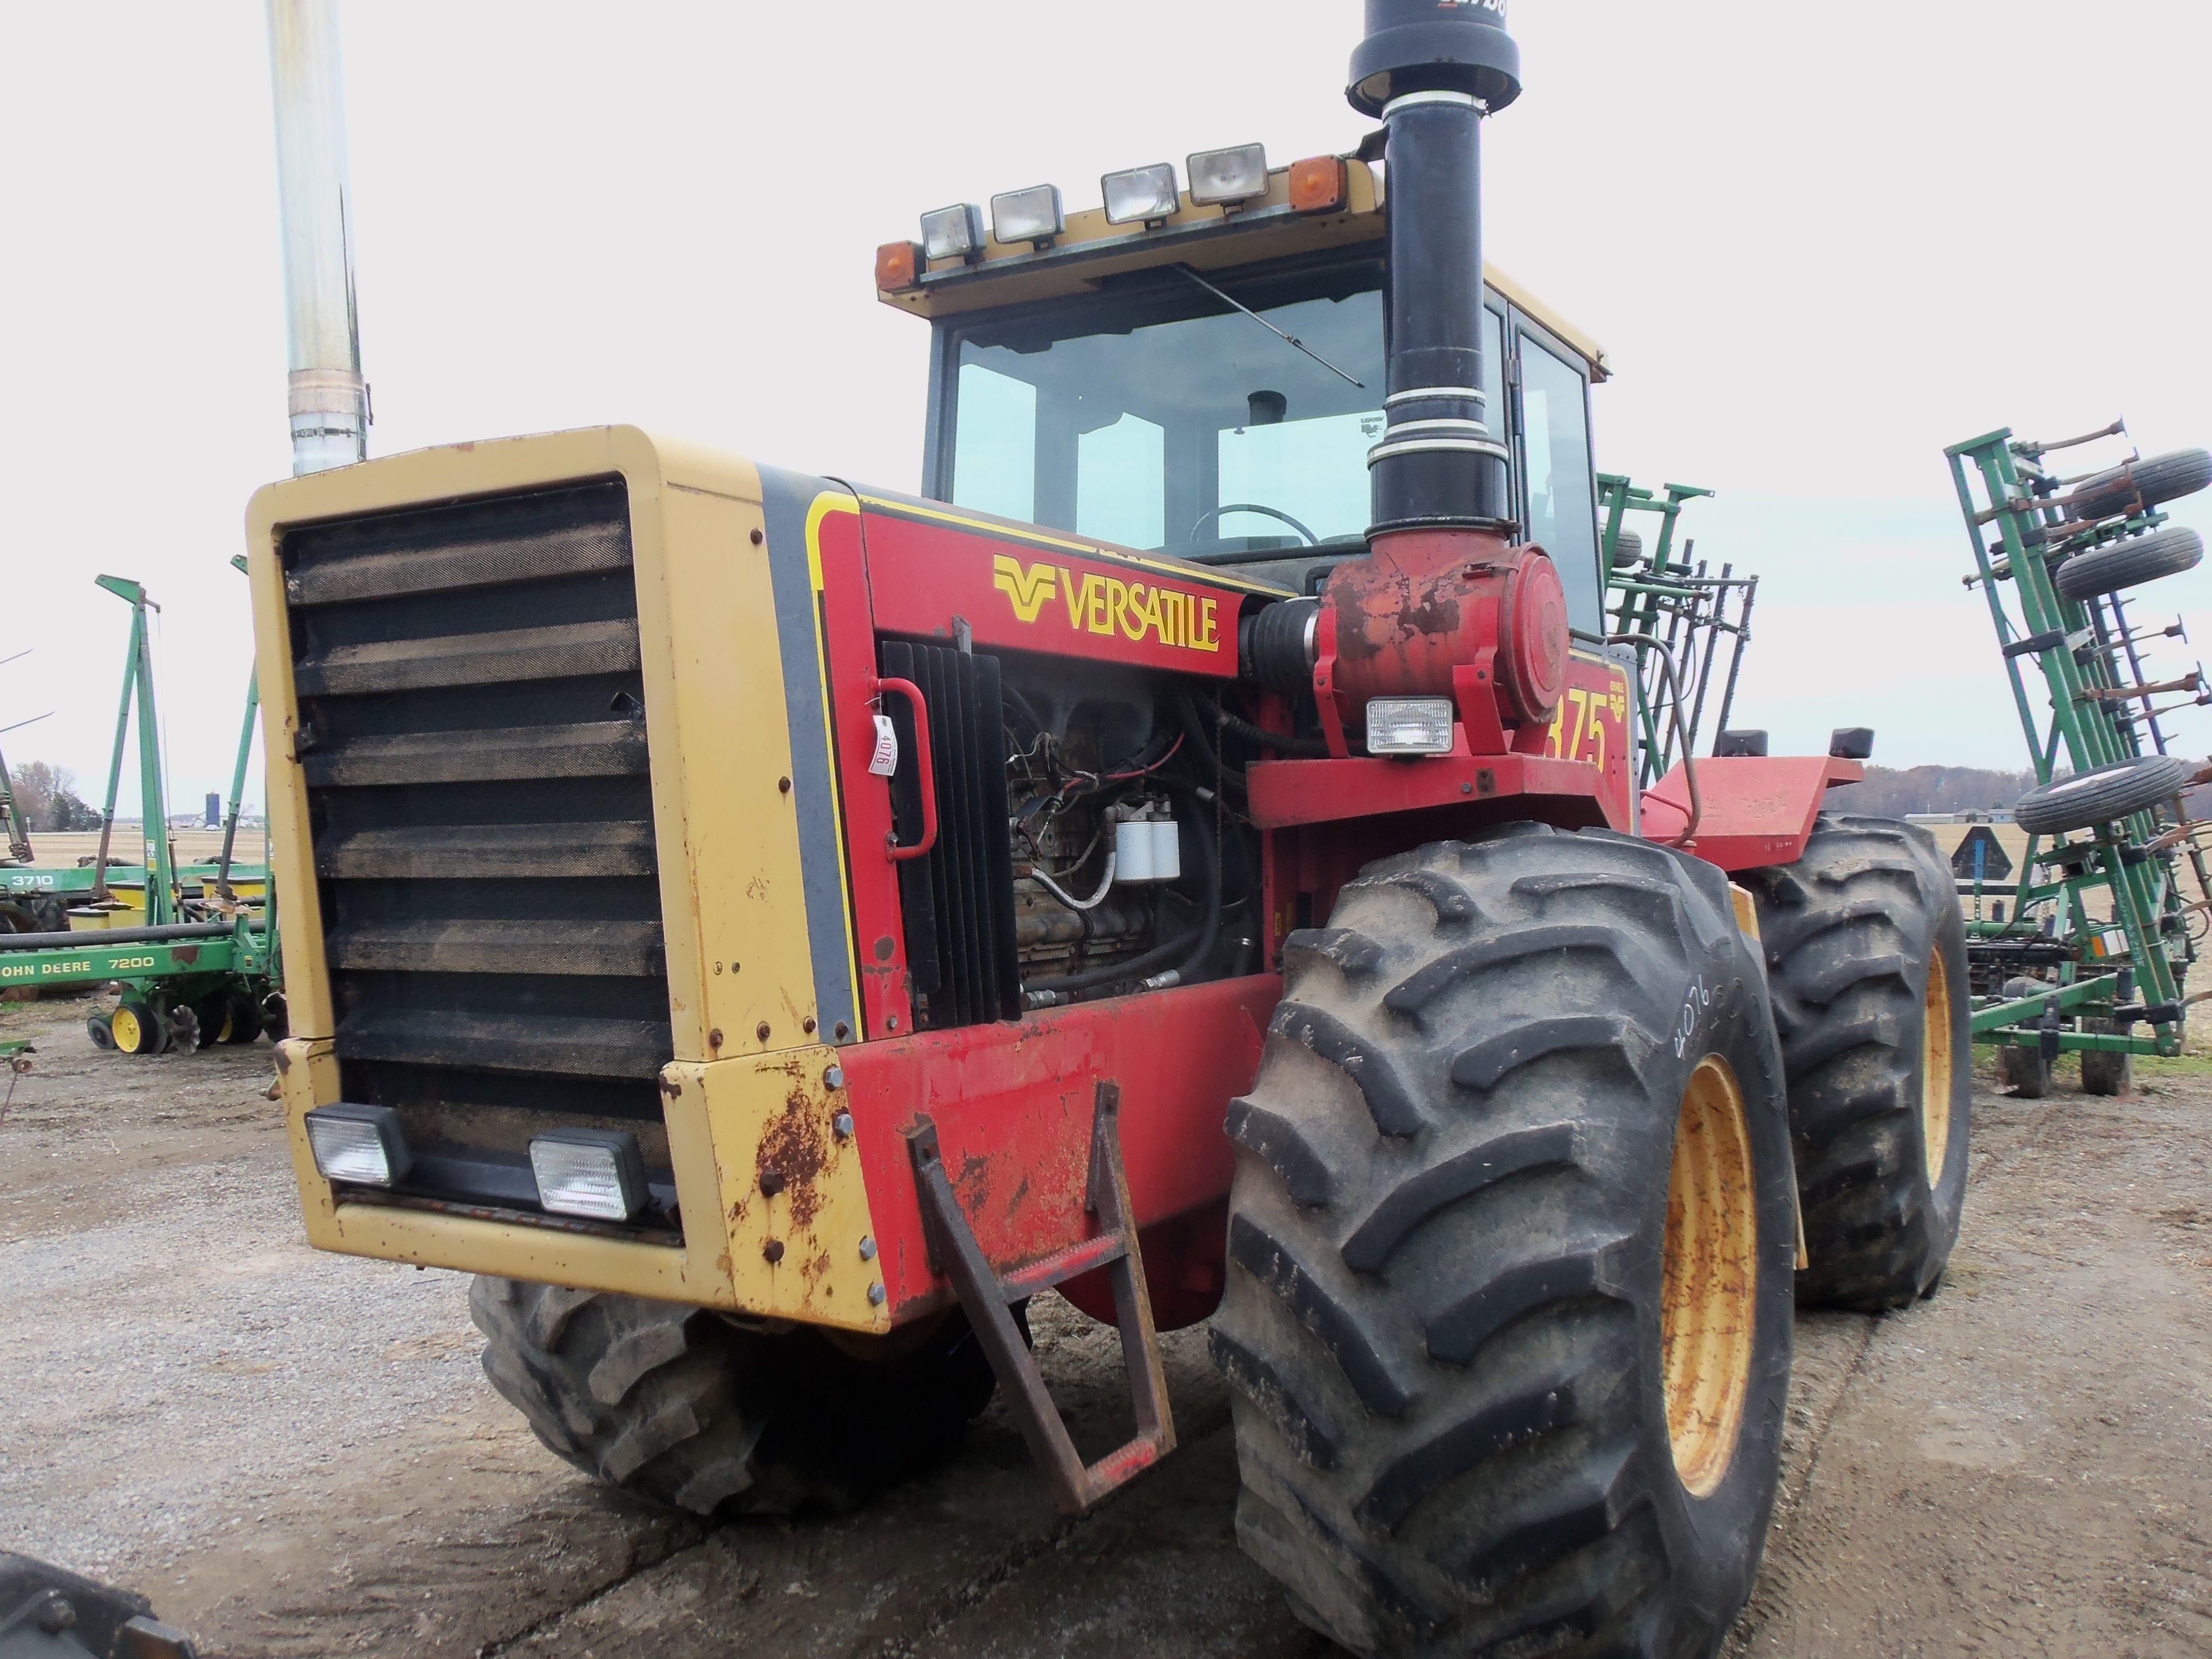 Versatile 875 4wd Tractor Tractors Old Farm Equipment Vintage